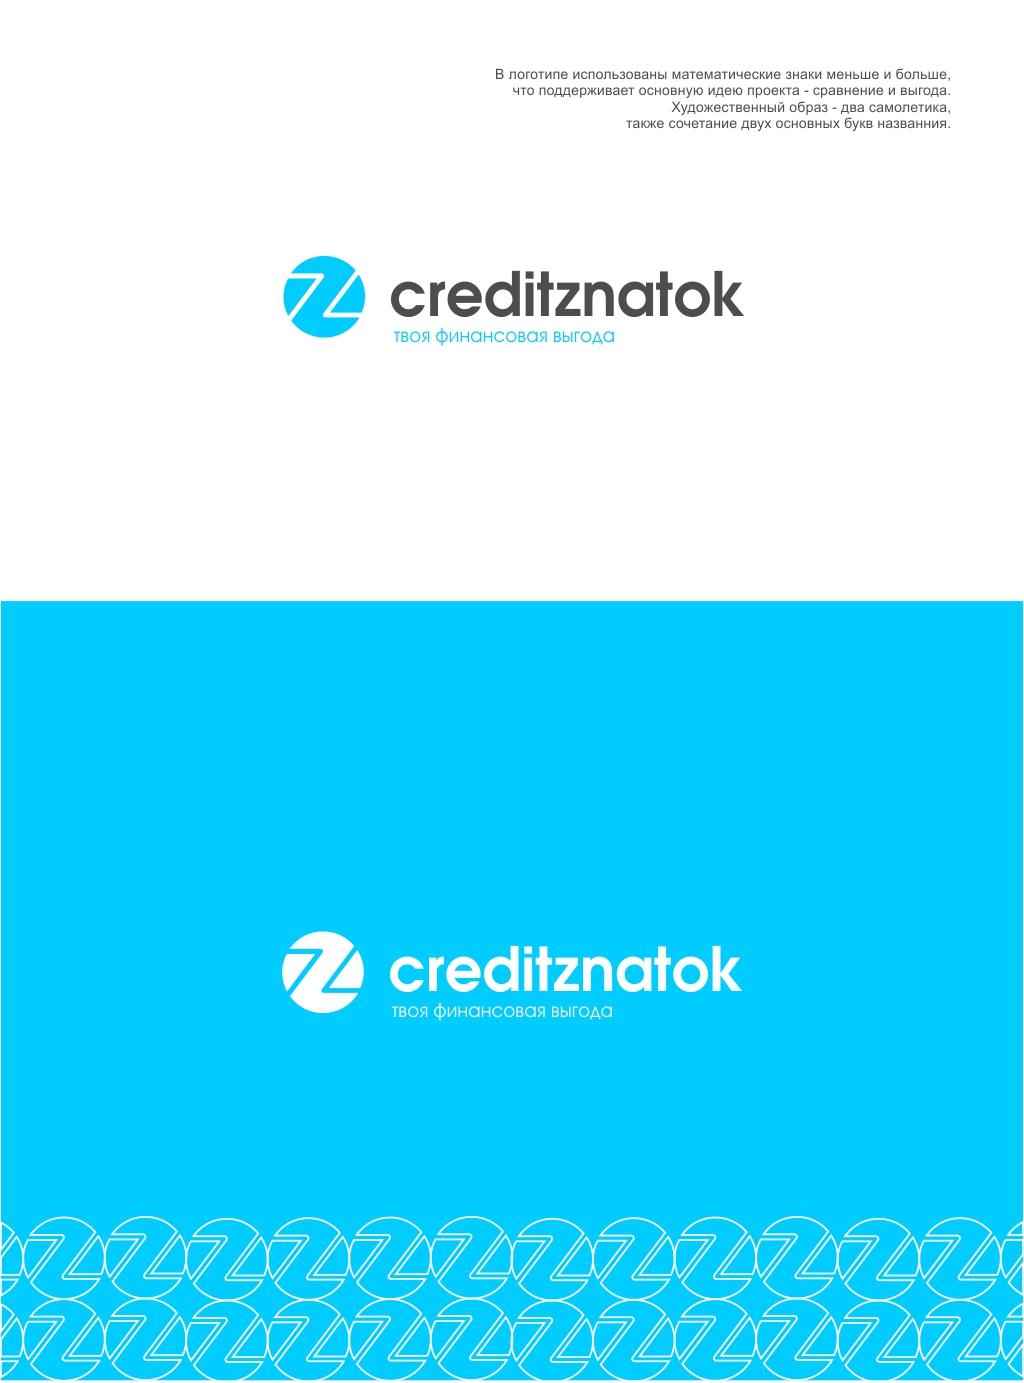 creditznatok.ru - логотип фото f_802589c4209aeb17.jpg